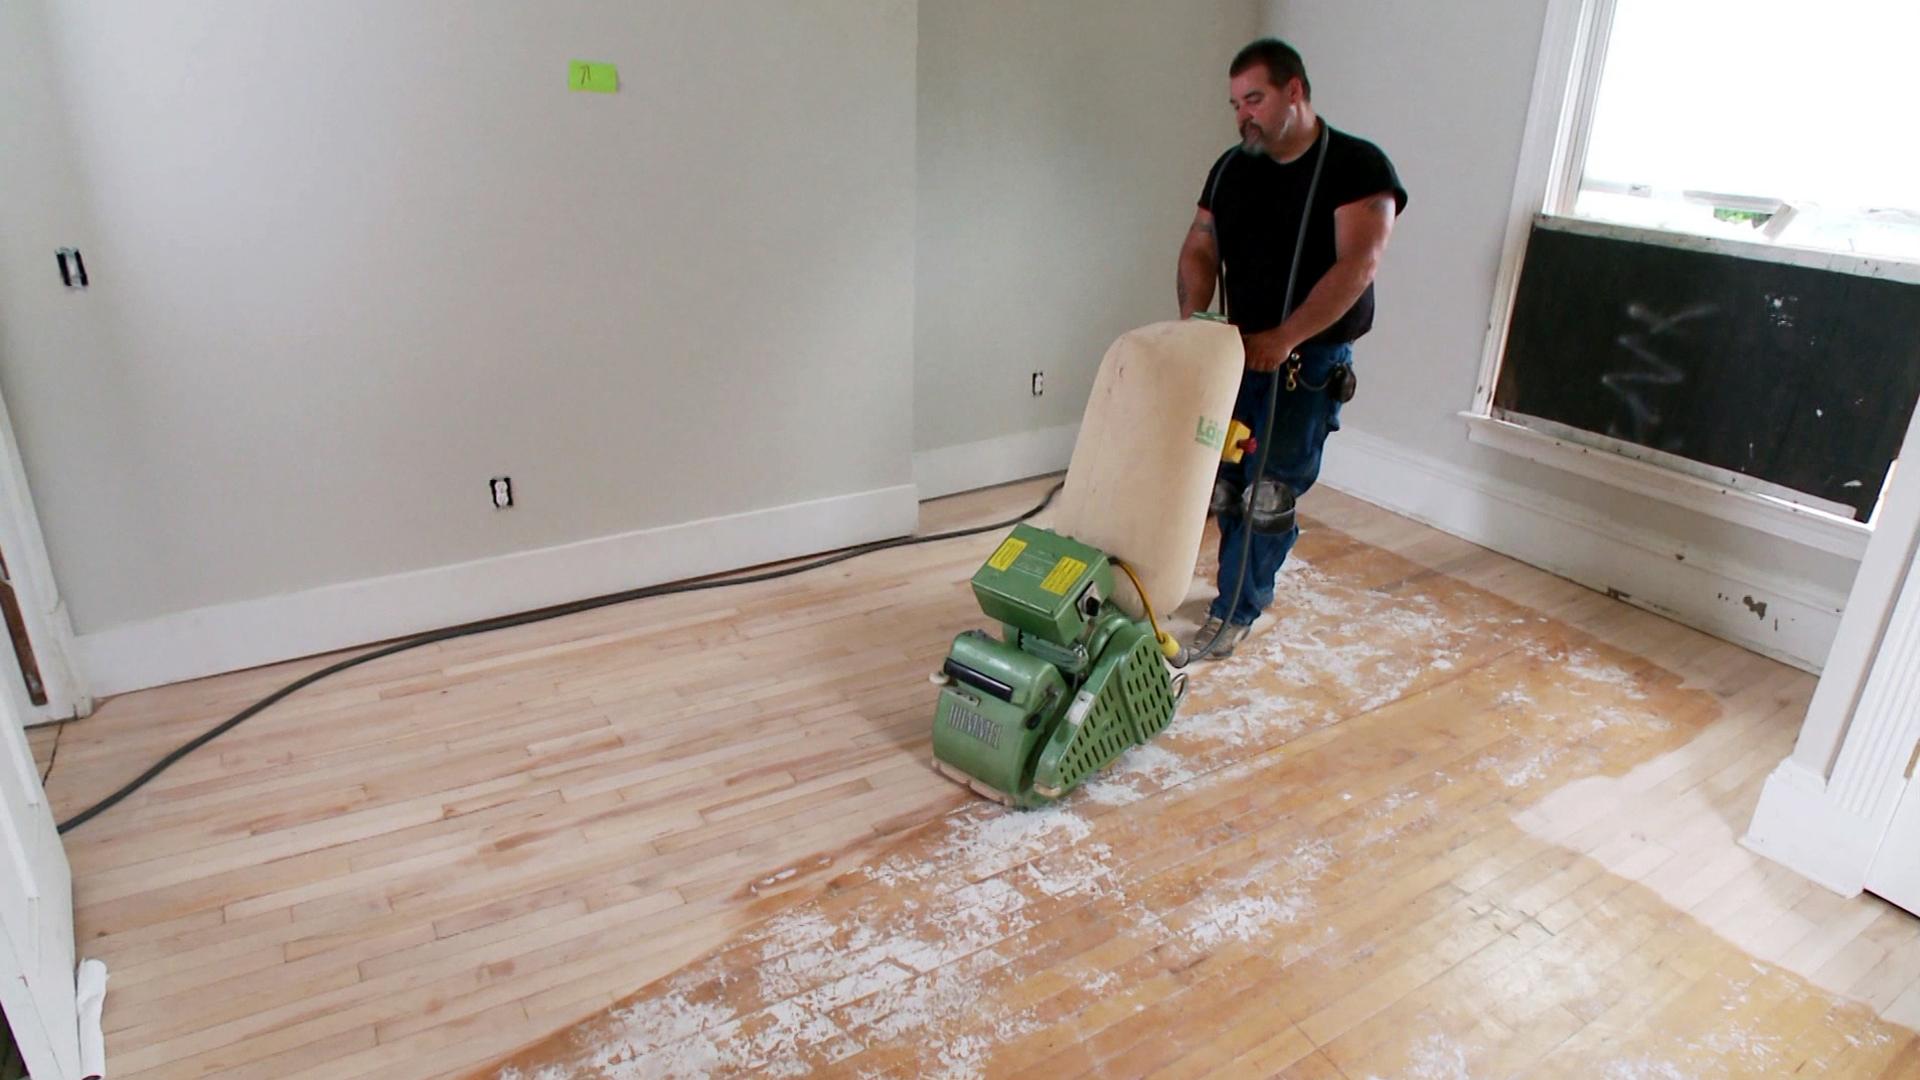 Diy hardwood floor hardwood floors refurbished video   diy GHRBDLX